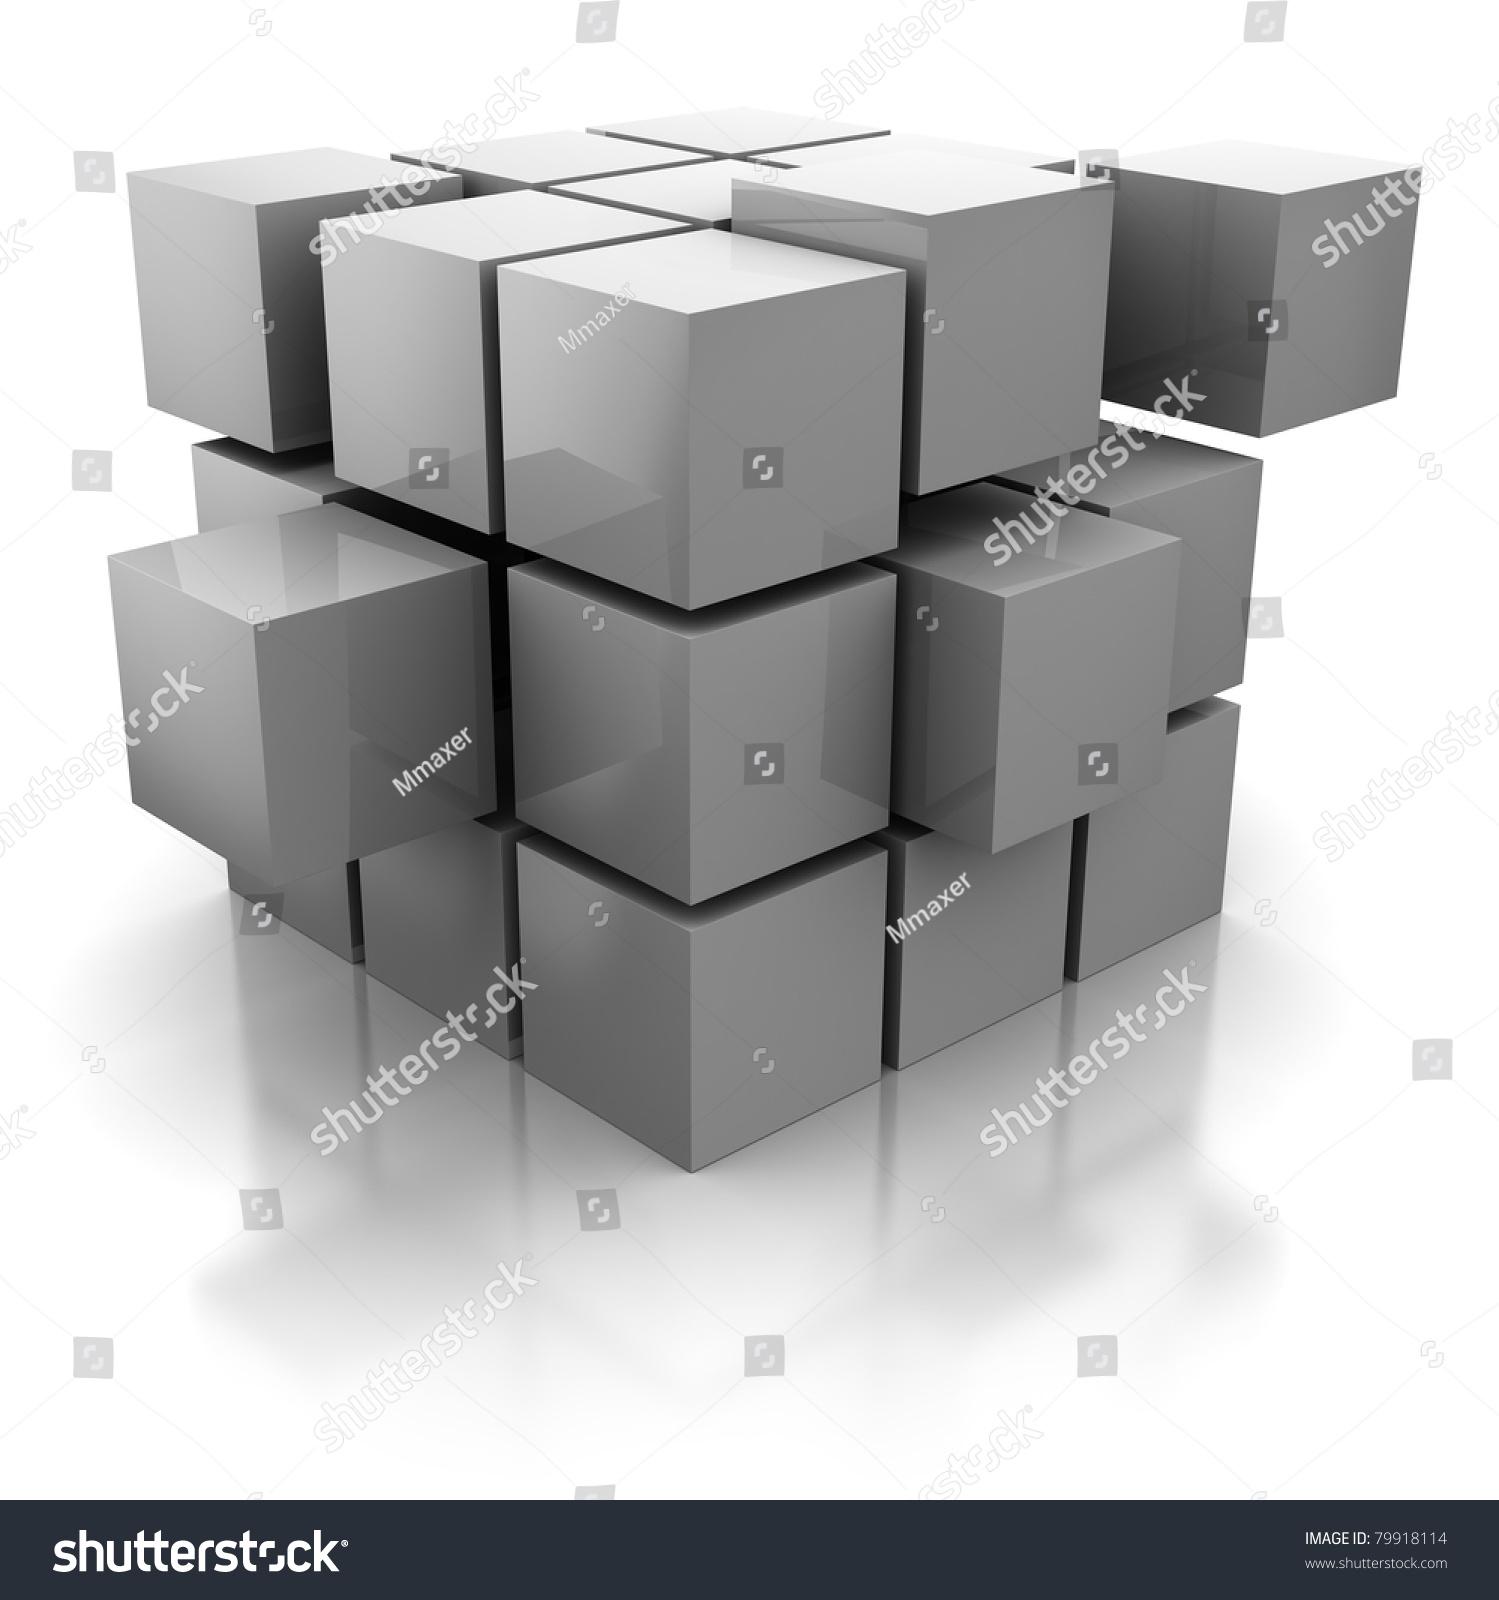 Building blocks abstract stock photos